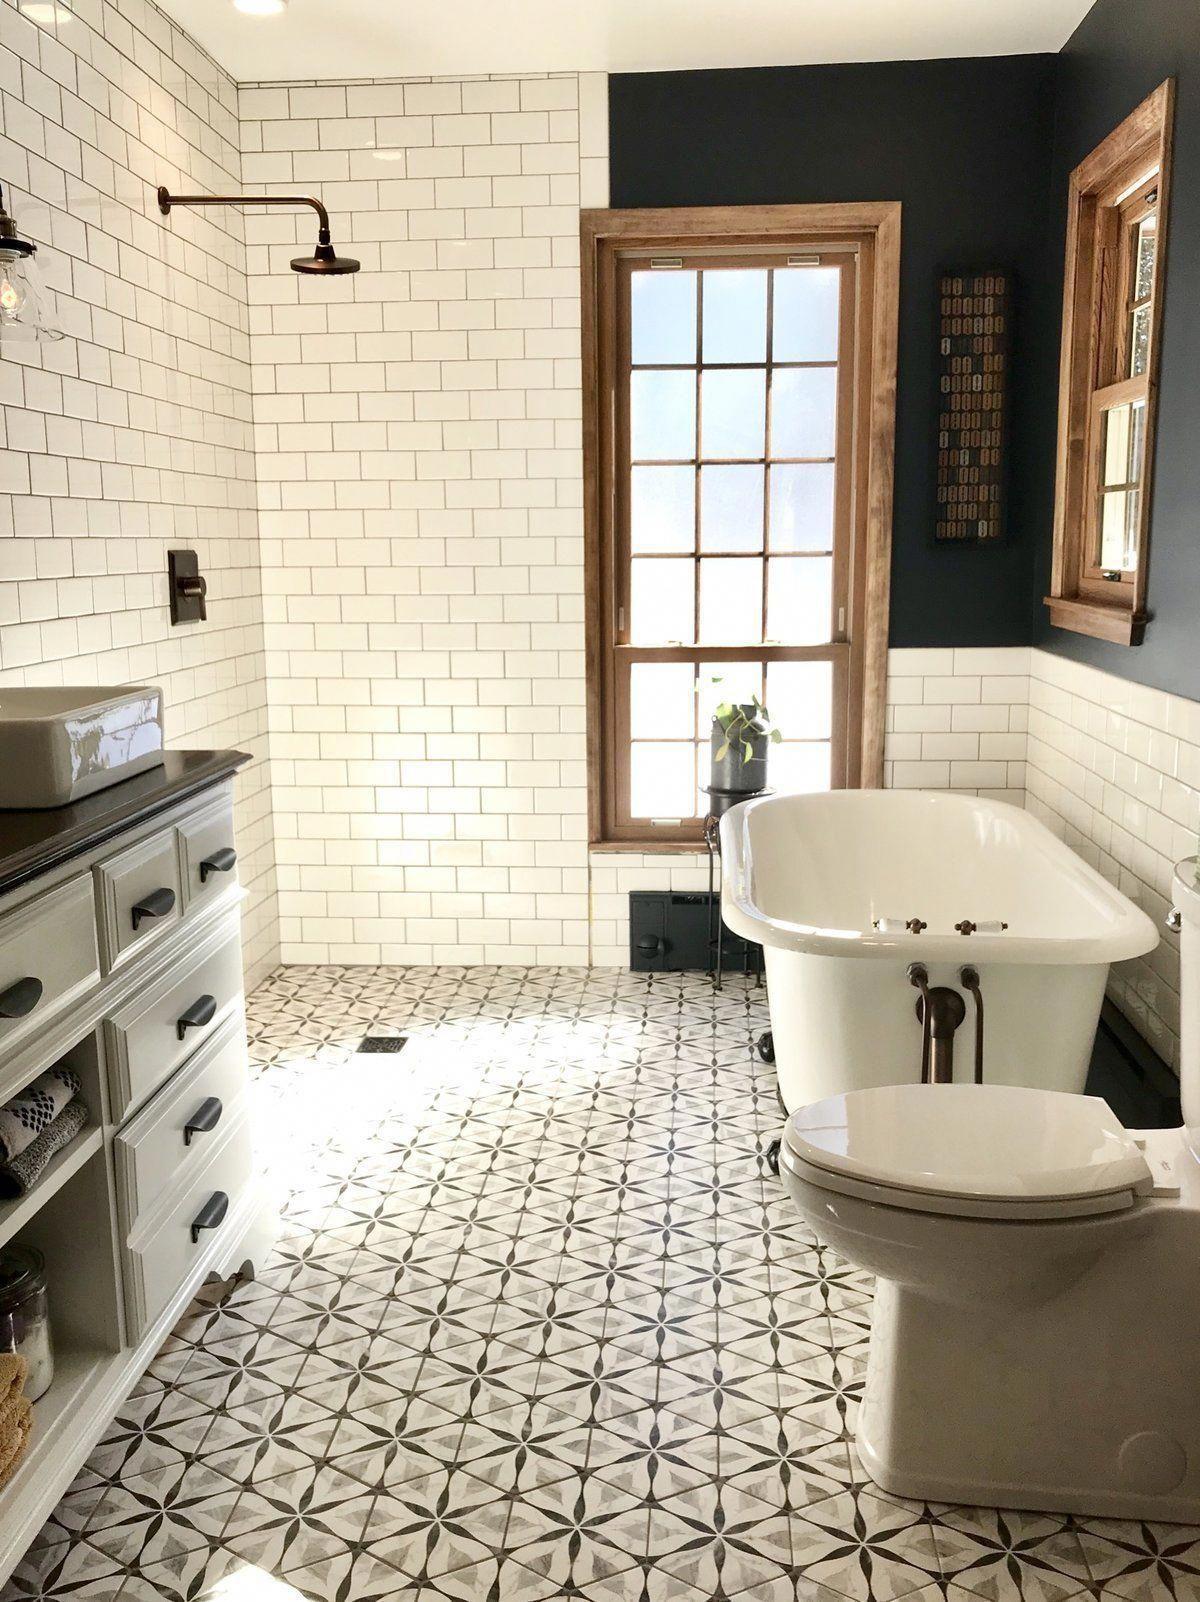 Karra 7 X 8 Porcelain Patterned Wall Floor Tile Bathrooms Remodel Small Bathroom Bathroom Design Bathroom design x 8